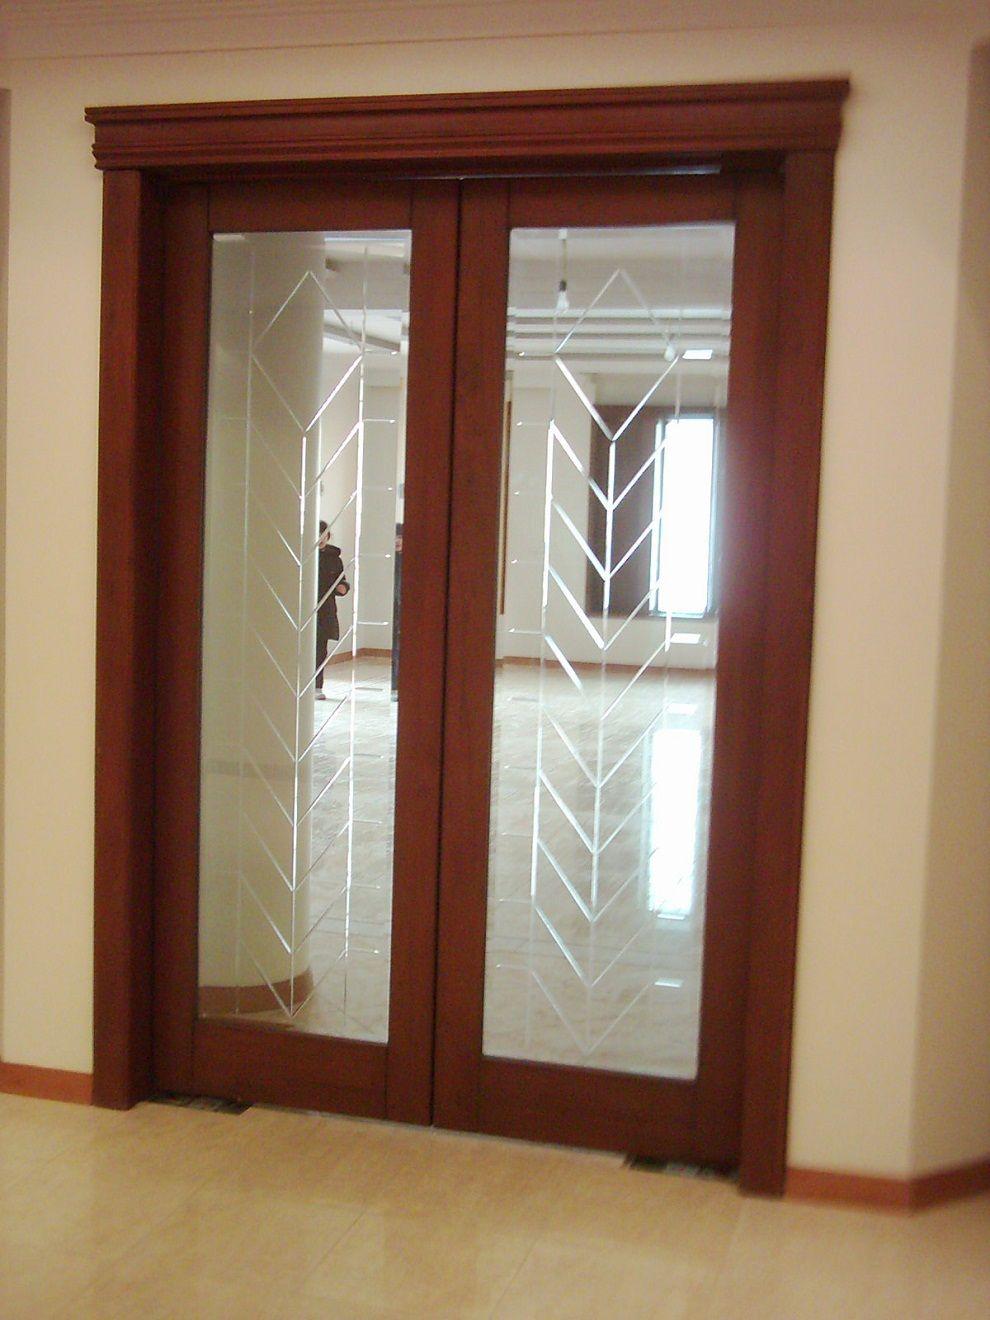 Easy Diy Prehung Interior French Doors Interior Doors For Sale French Doors Interior Door Design Interior